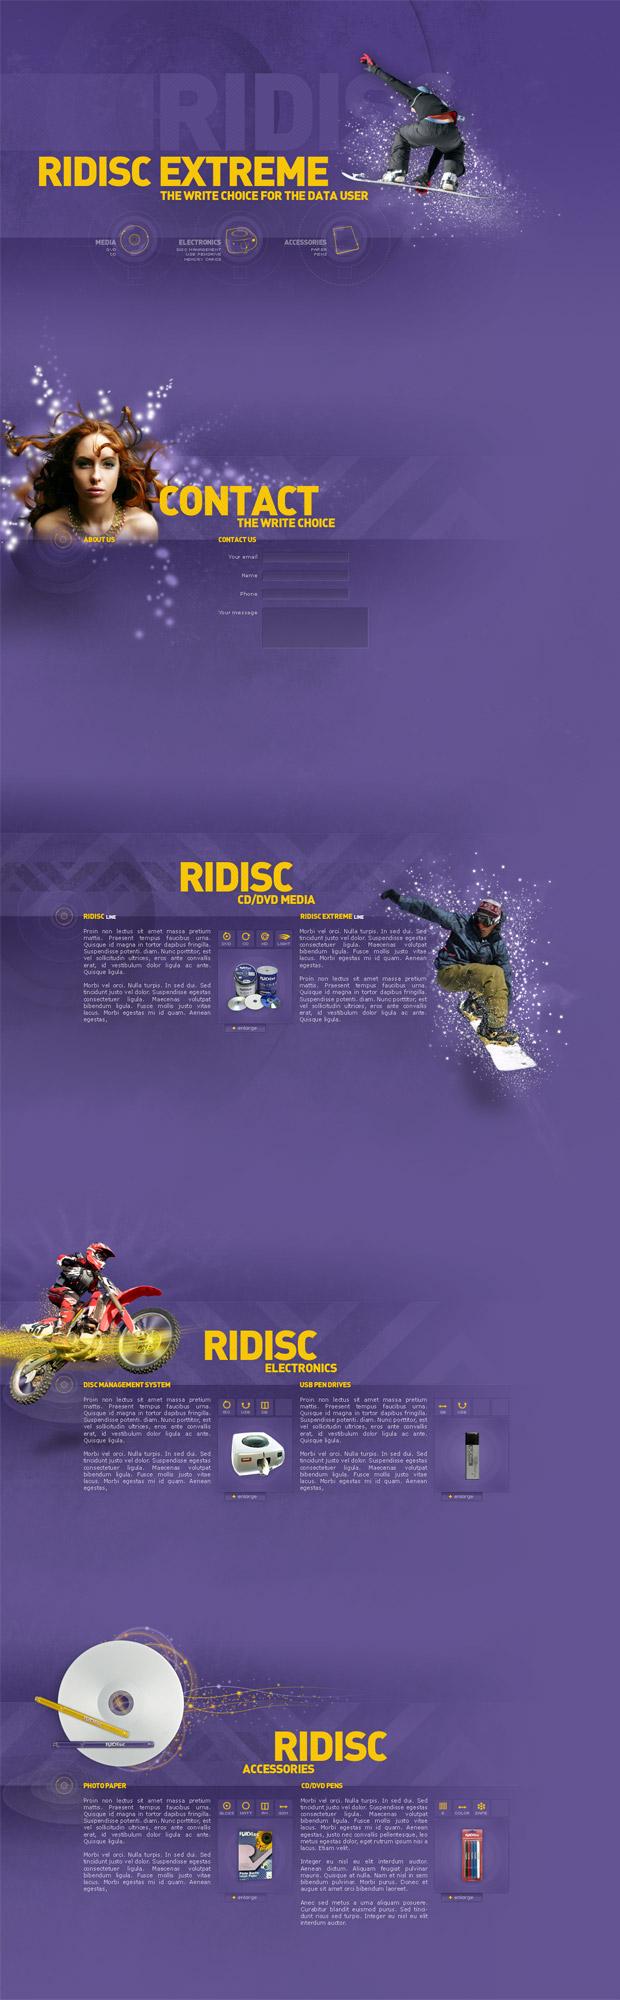 Ridisc: layout by 9gods